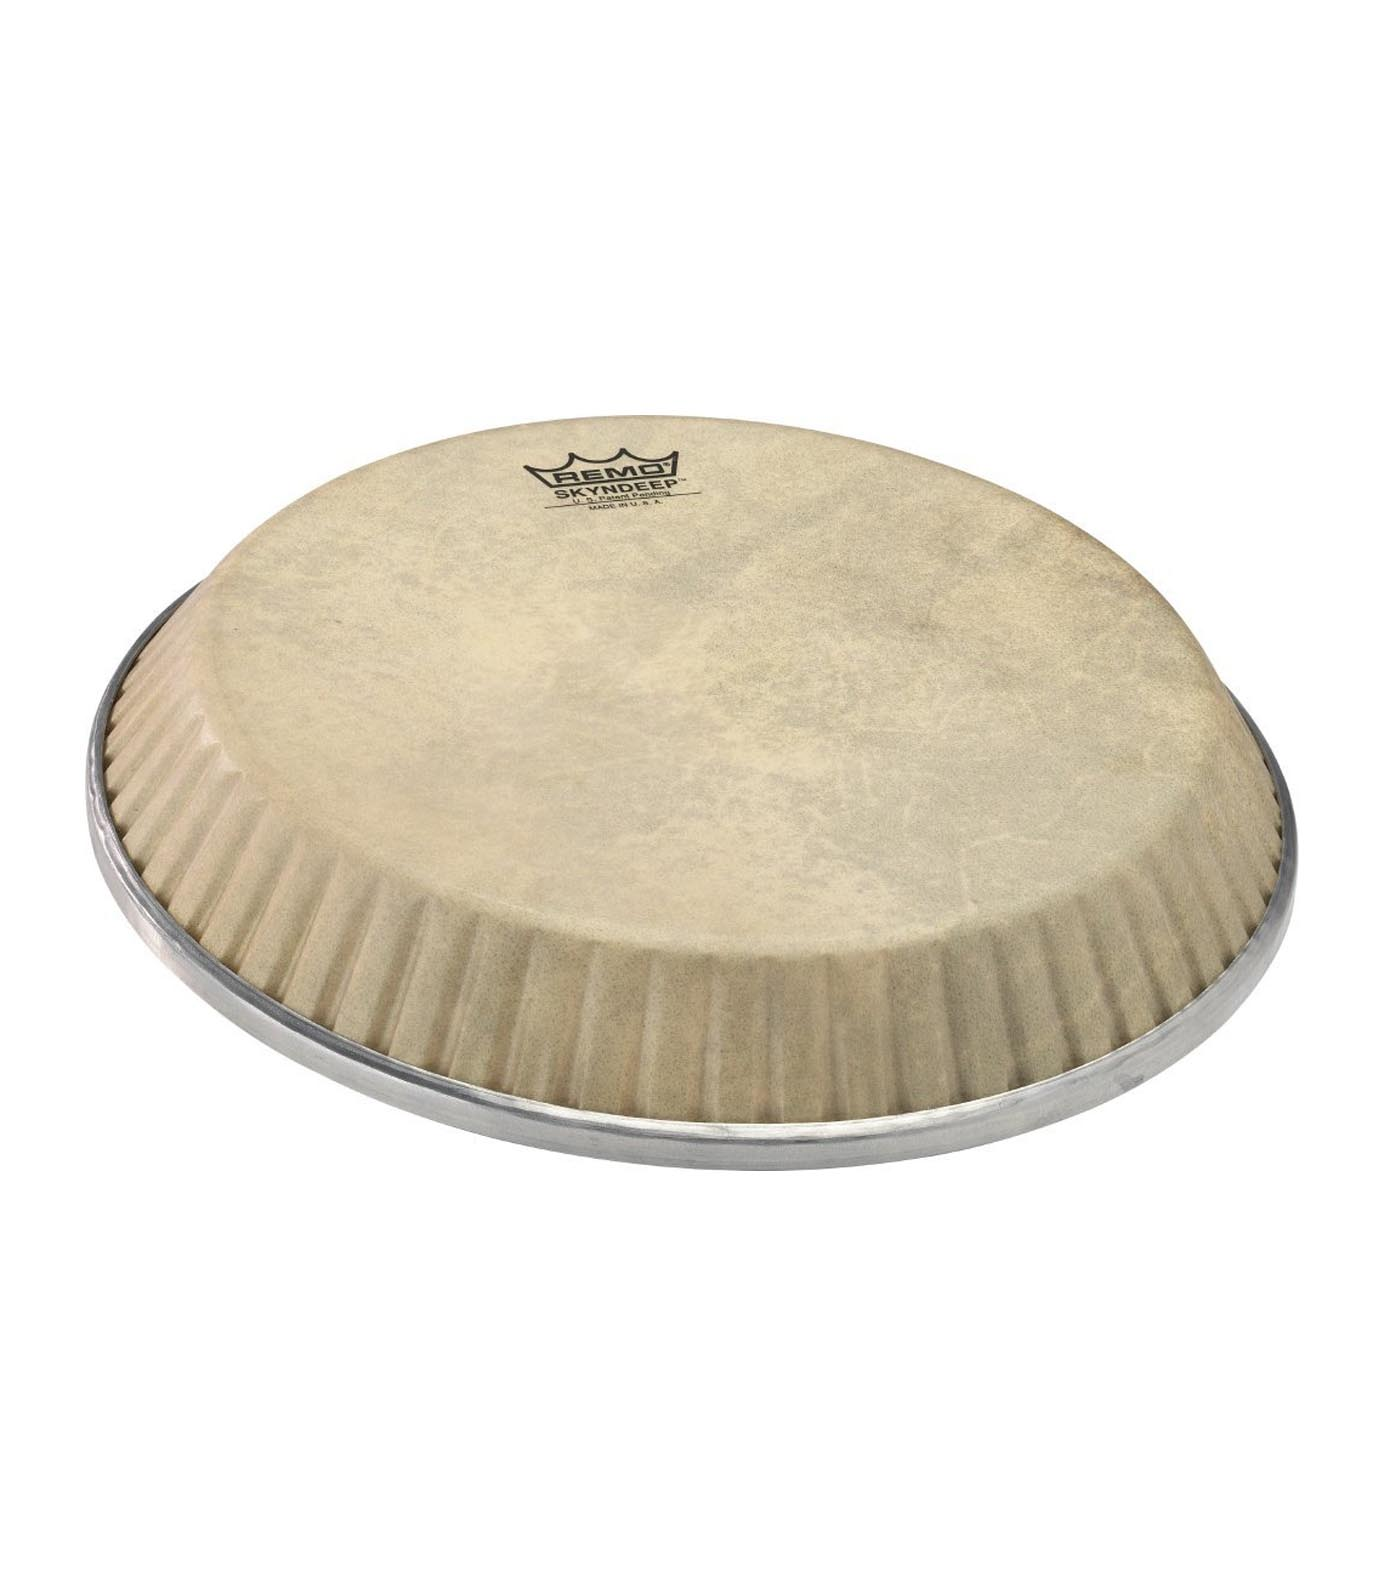 Buy Remo - Conga Drumhead Symmetry 11 75 D4 SKYNDEEP C